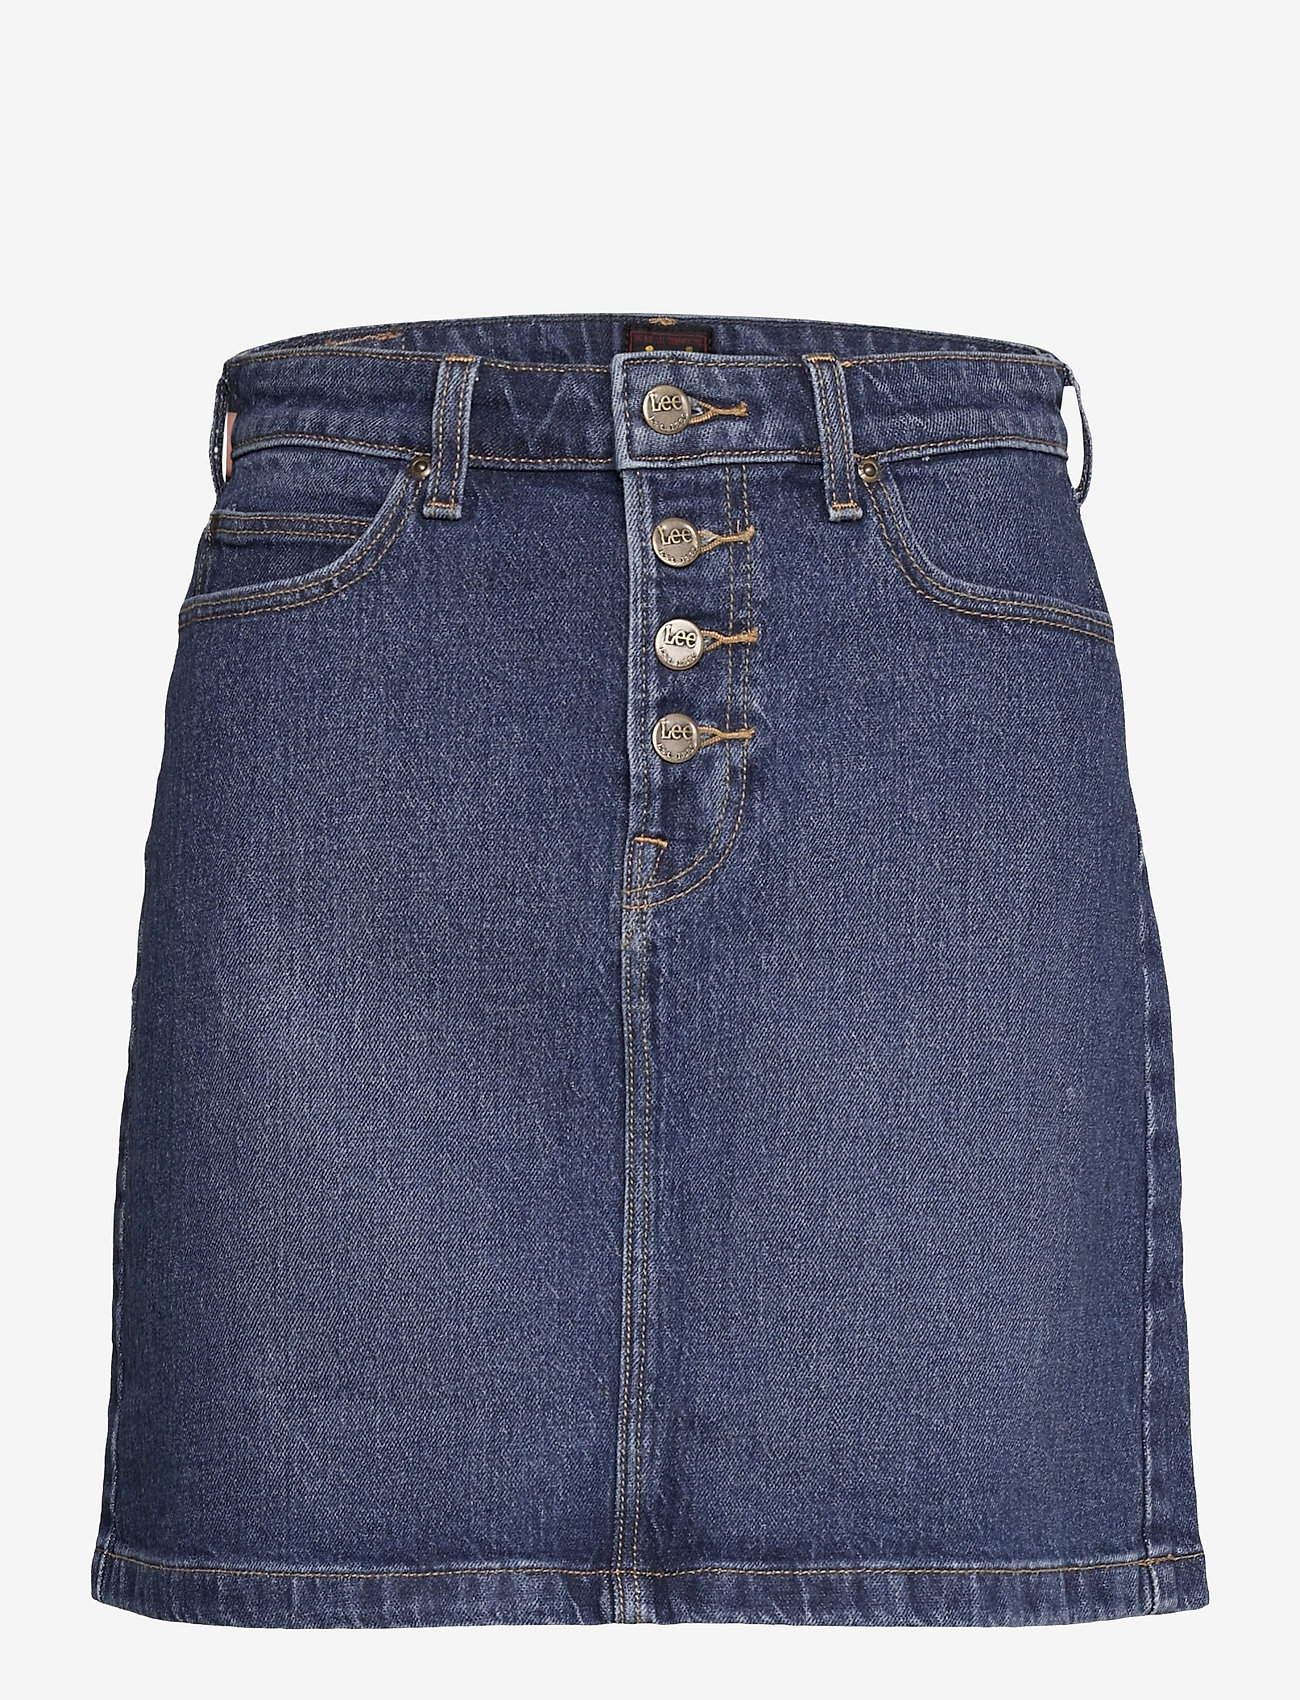 Lee Jeans - BUTTON FLY A LINE SK - jeanskjolar - dark buxton - 0